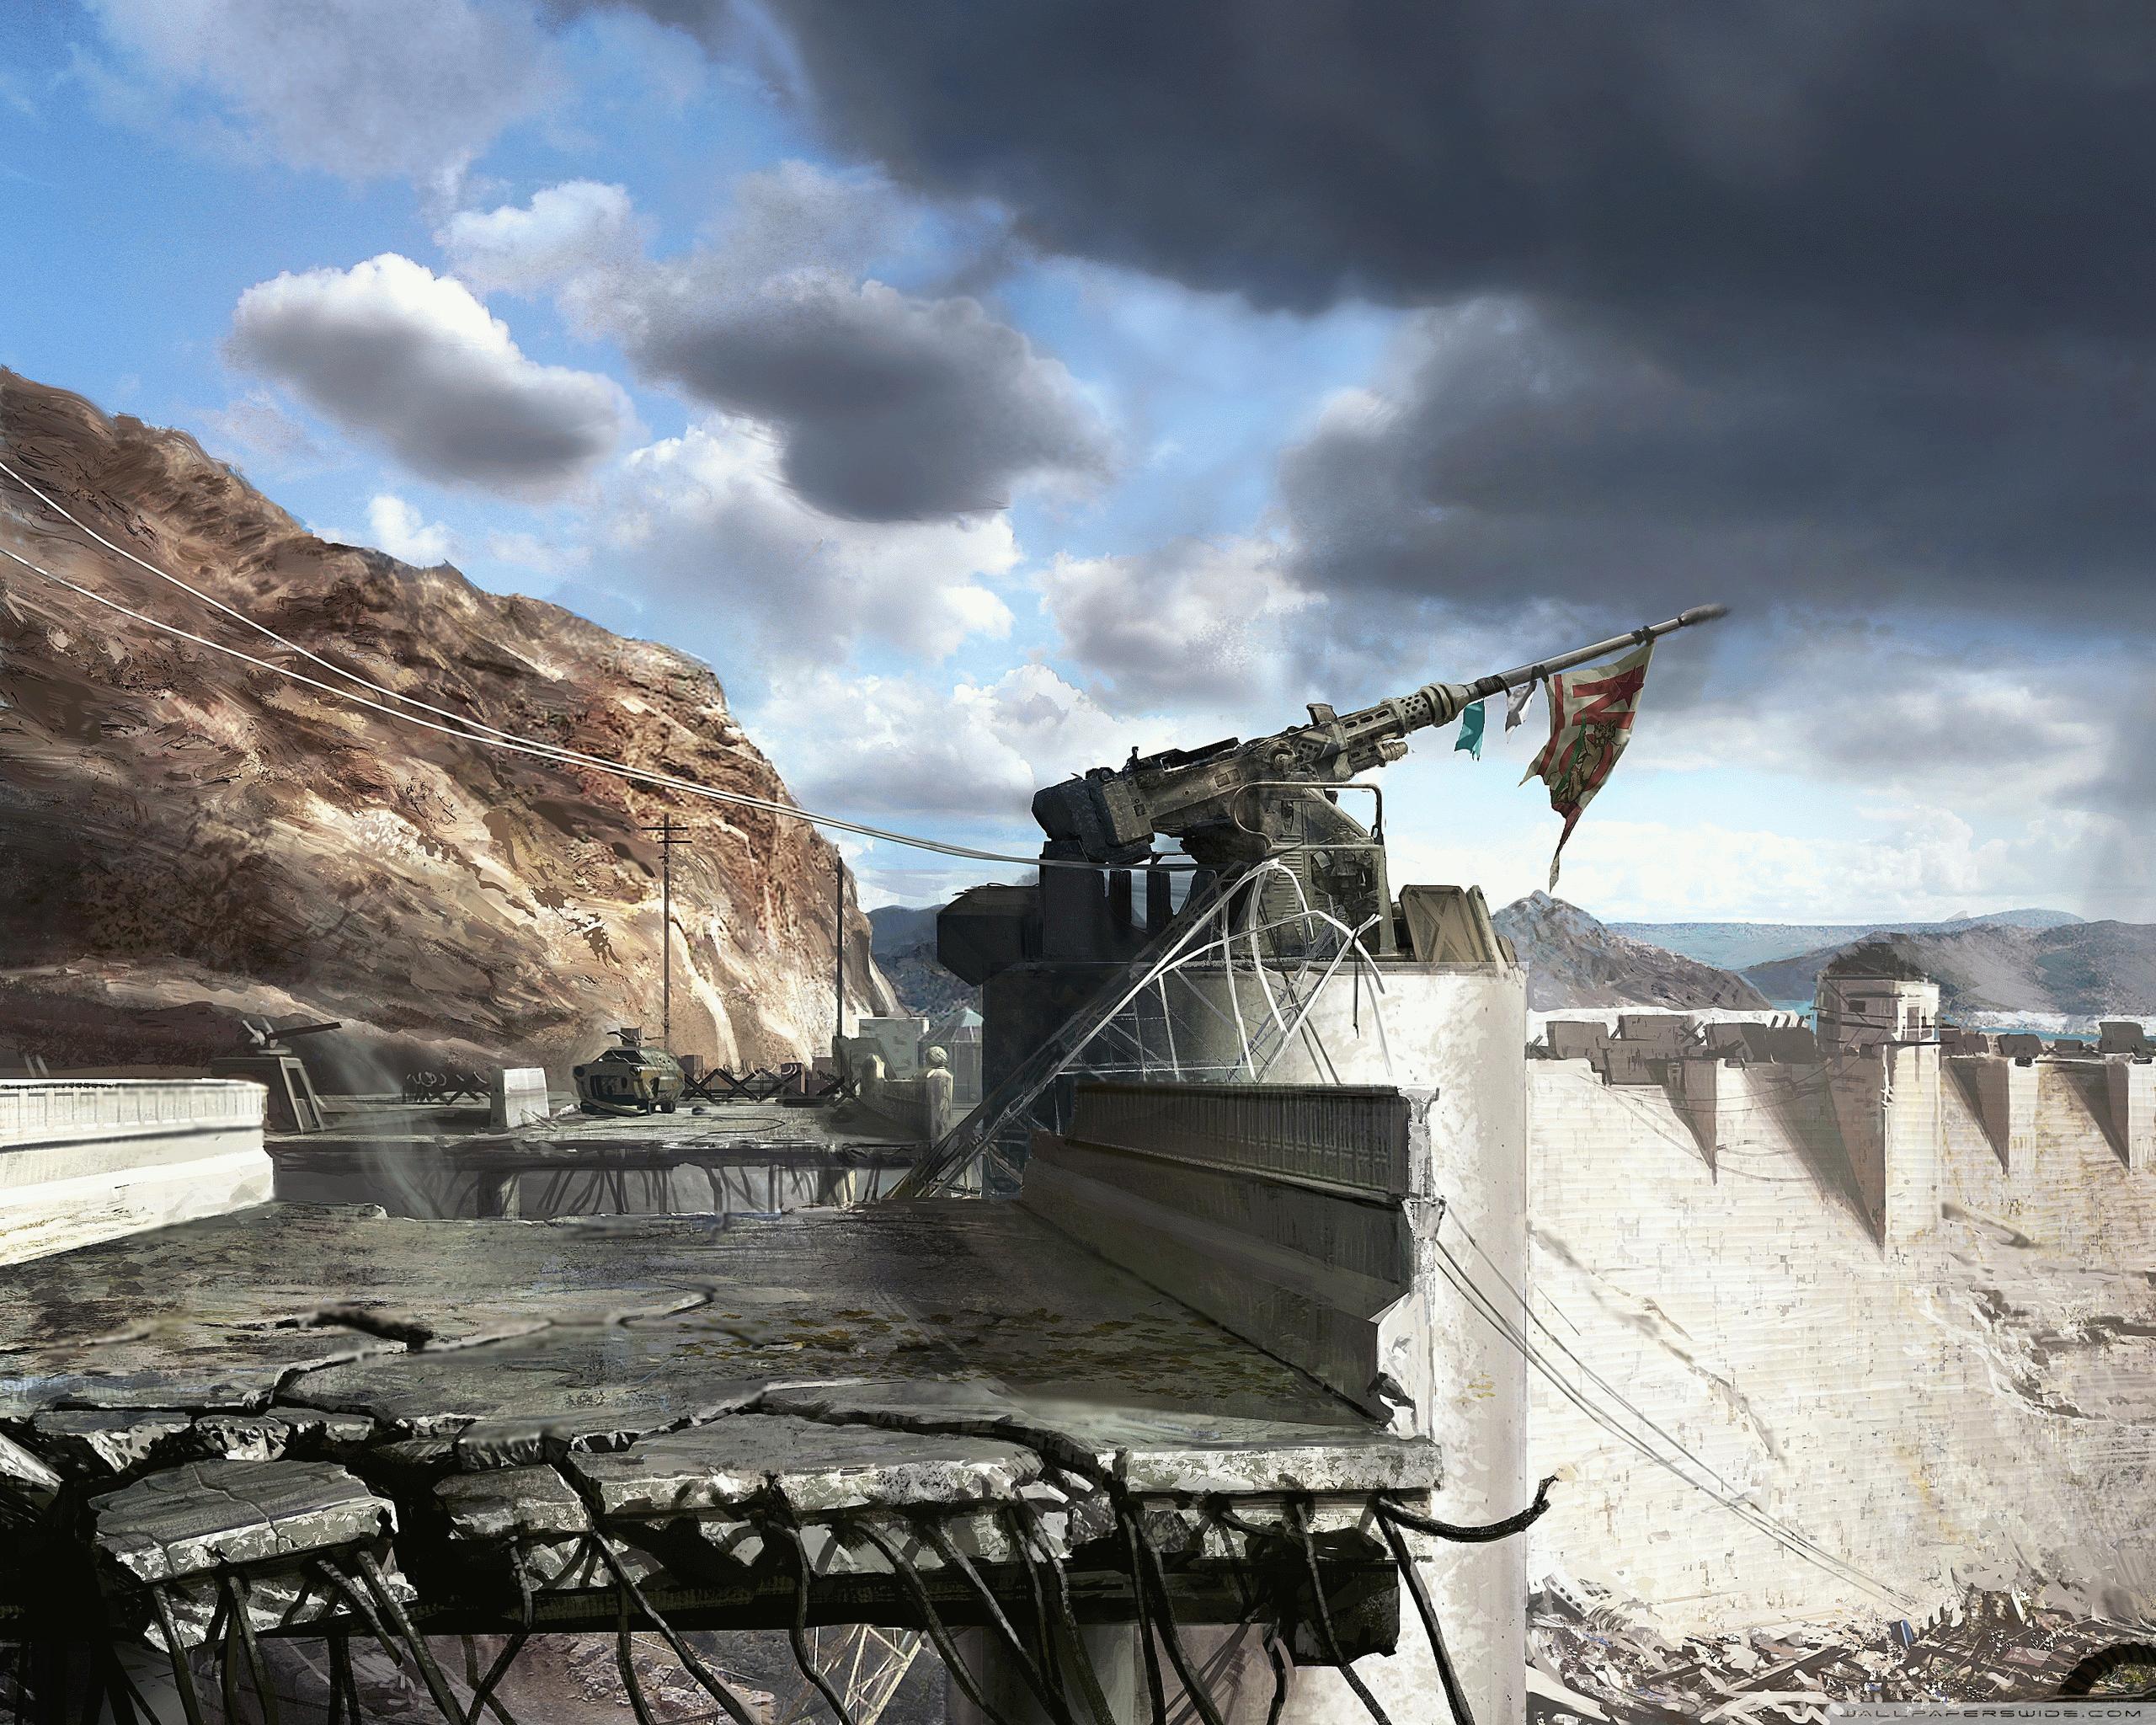 fallout_new_vegas_hoover_dam_concept_art-2560x2048.png